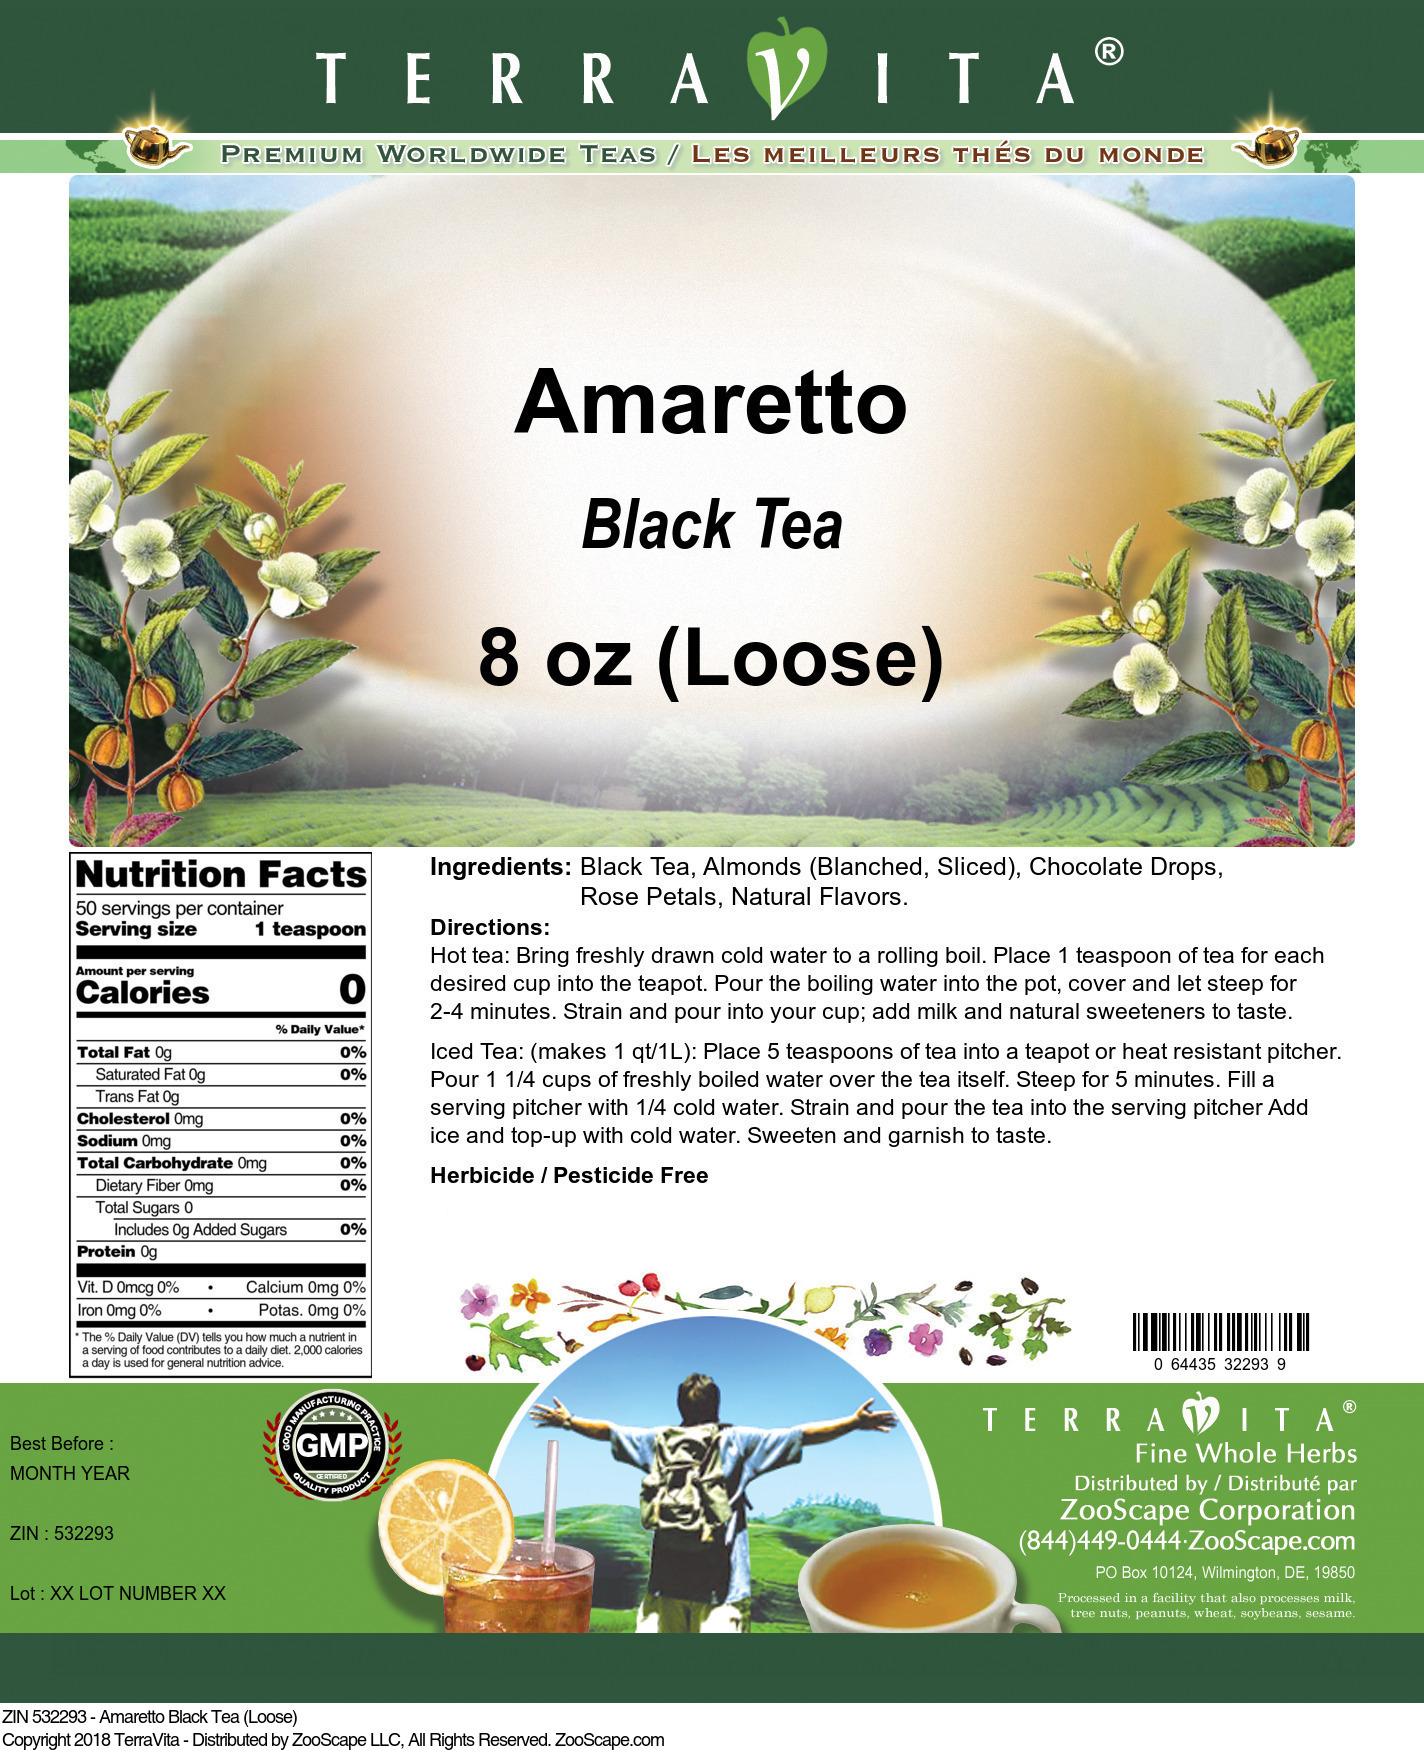 Amaretto Black Tea (Loose)